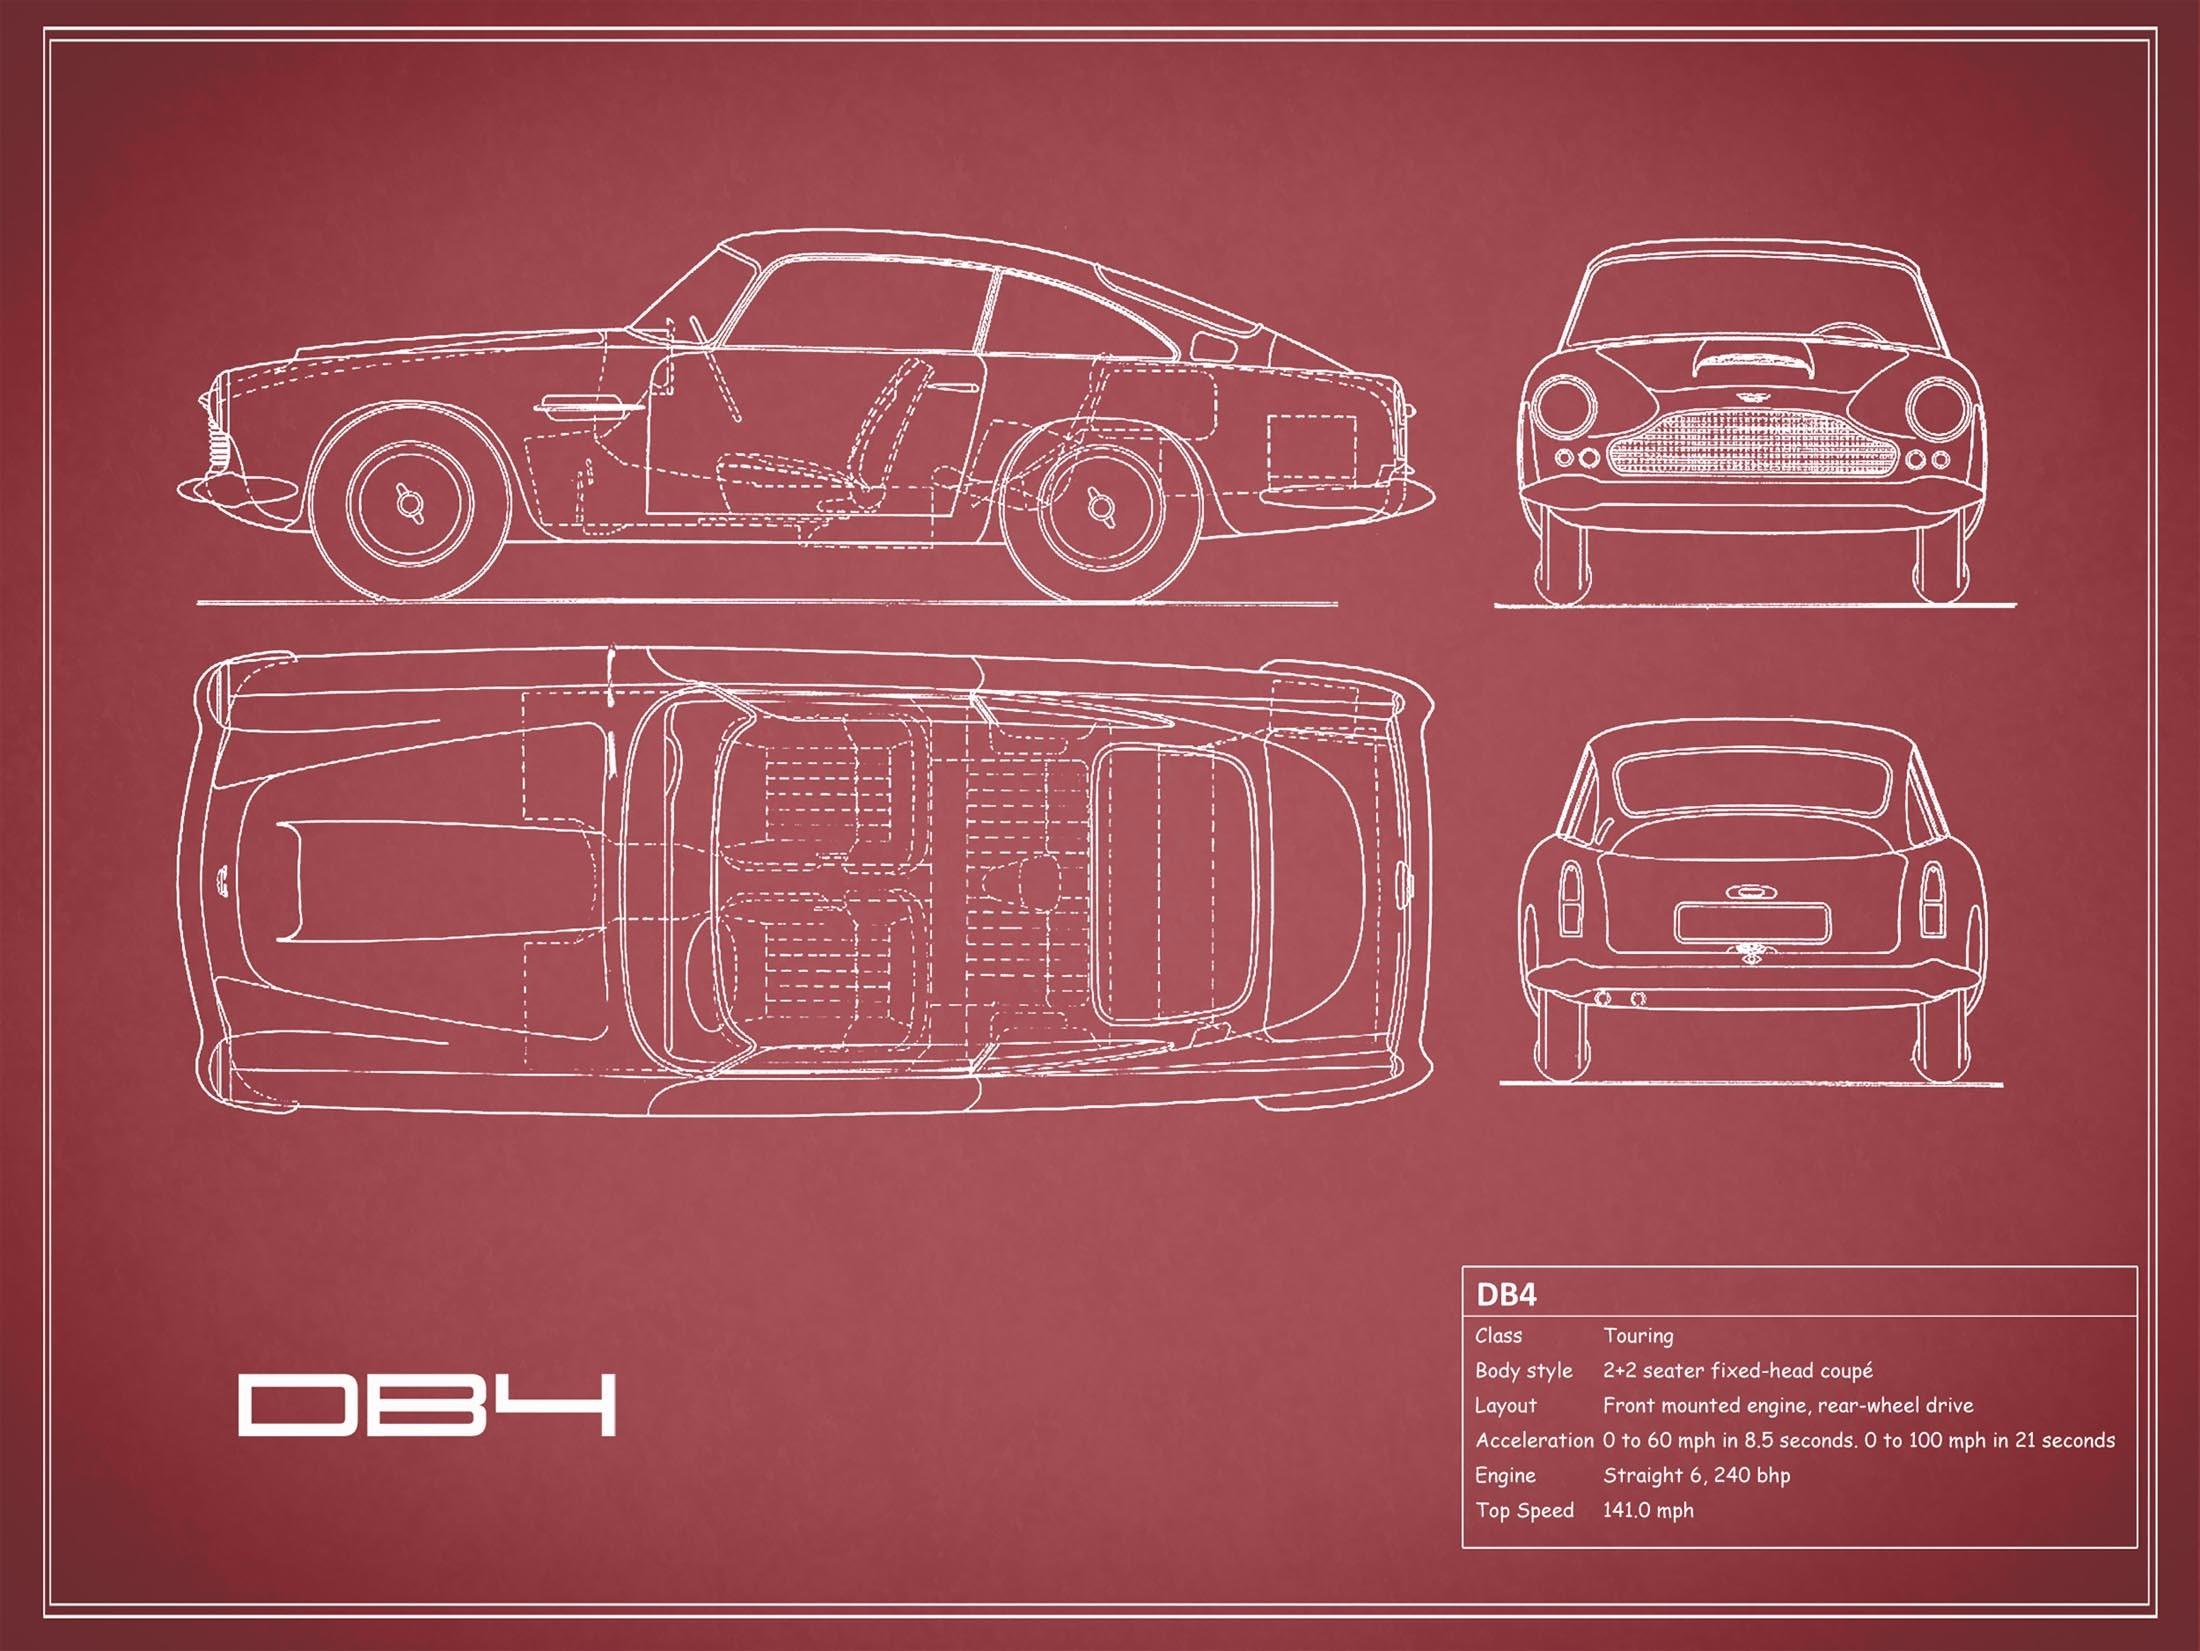 Aston Martin DB4 - Red